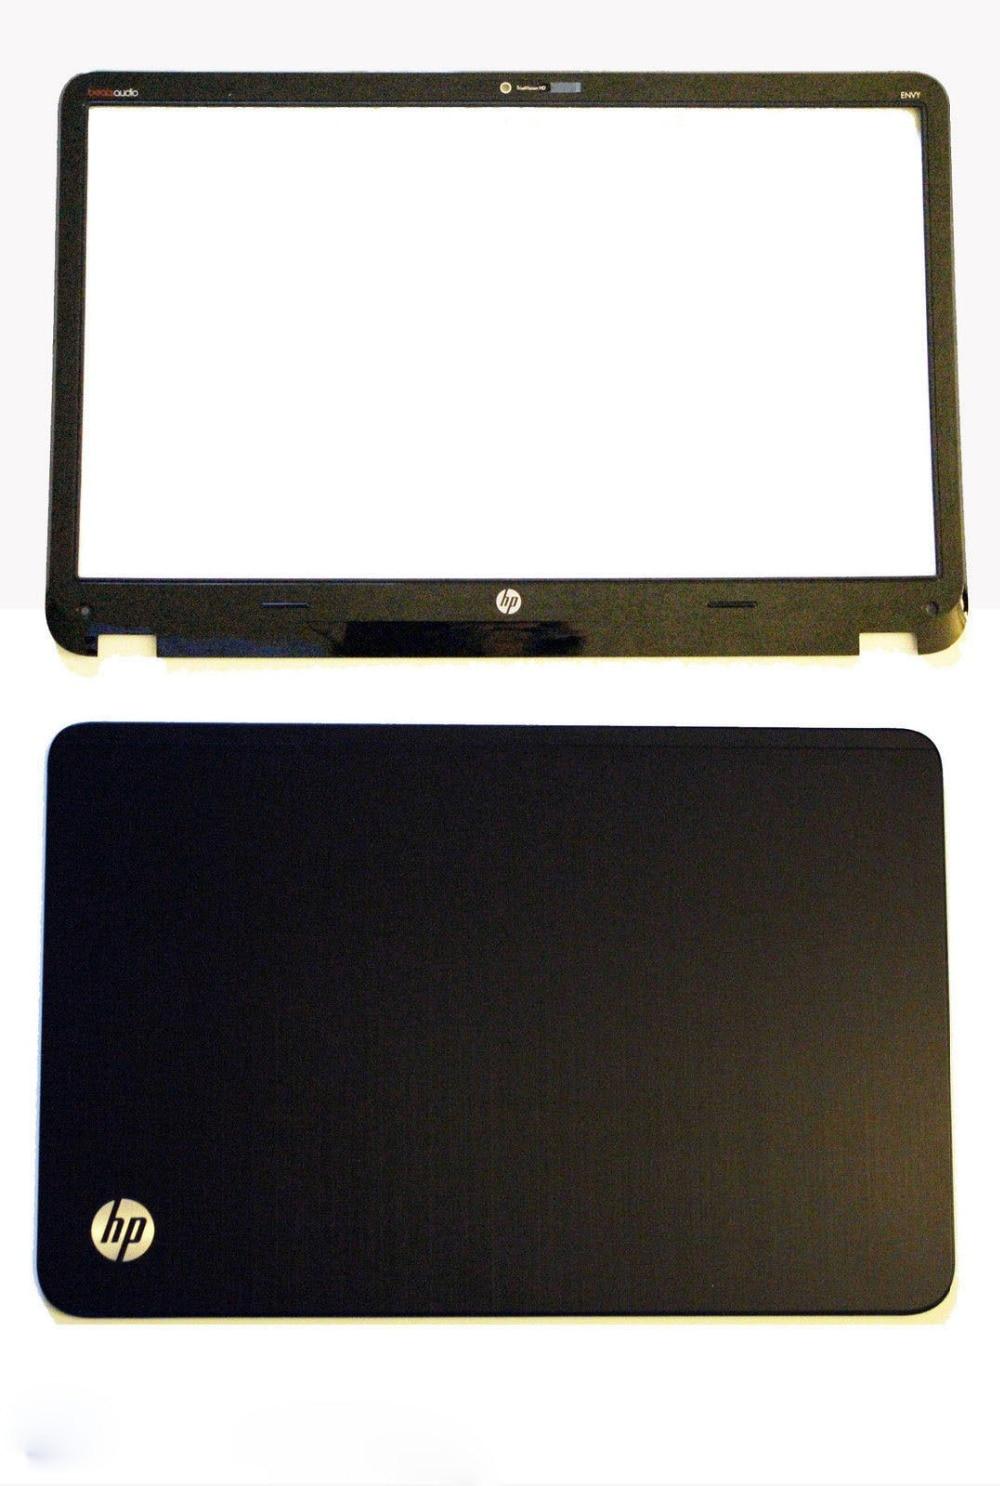 все цены на  HP Envy6 Envy 6-1000 LCD Back Cover Case & Front Bezel 692382-001 686591-001  онлайн